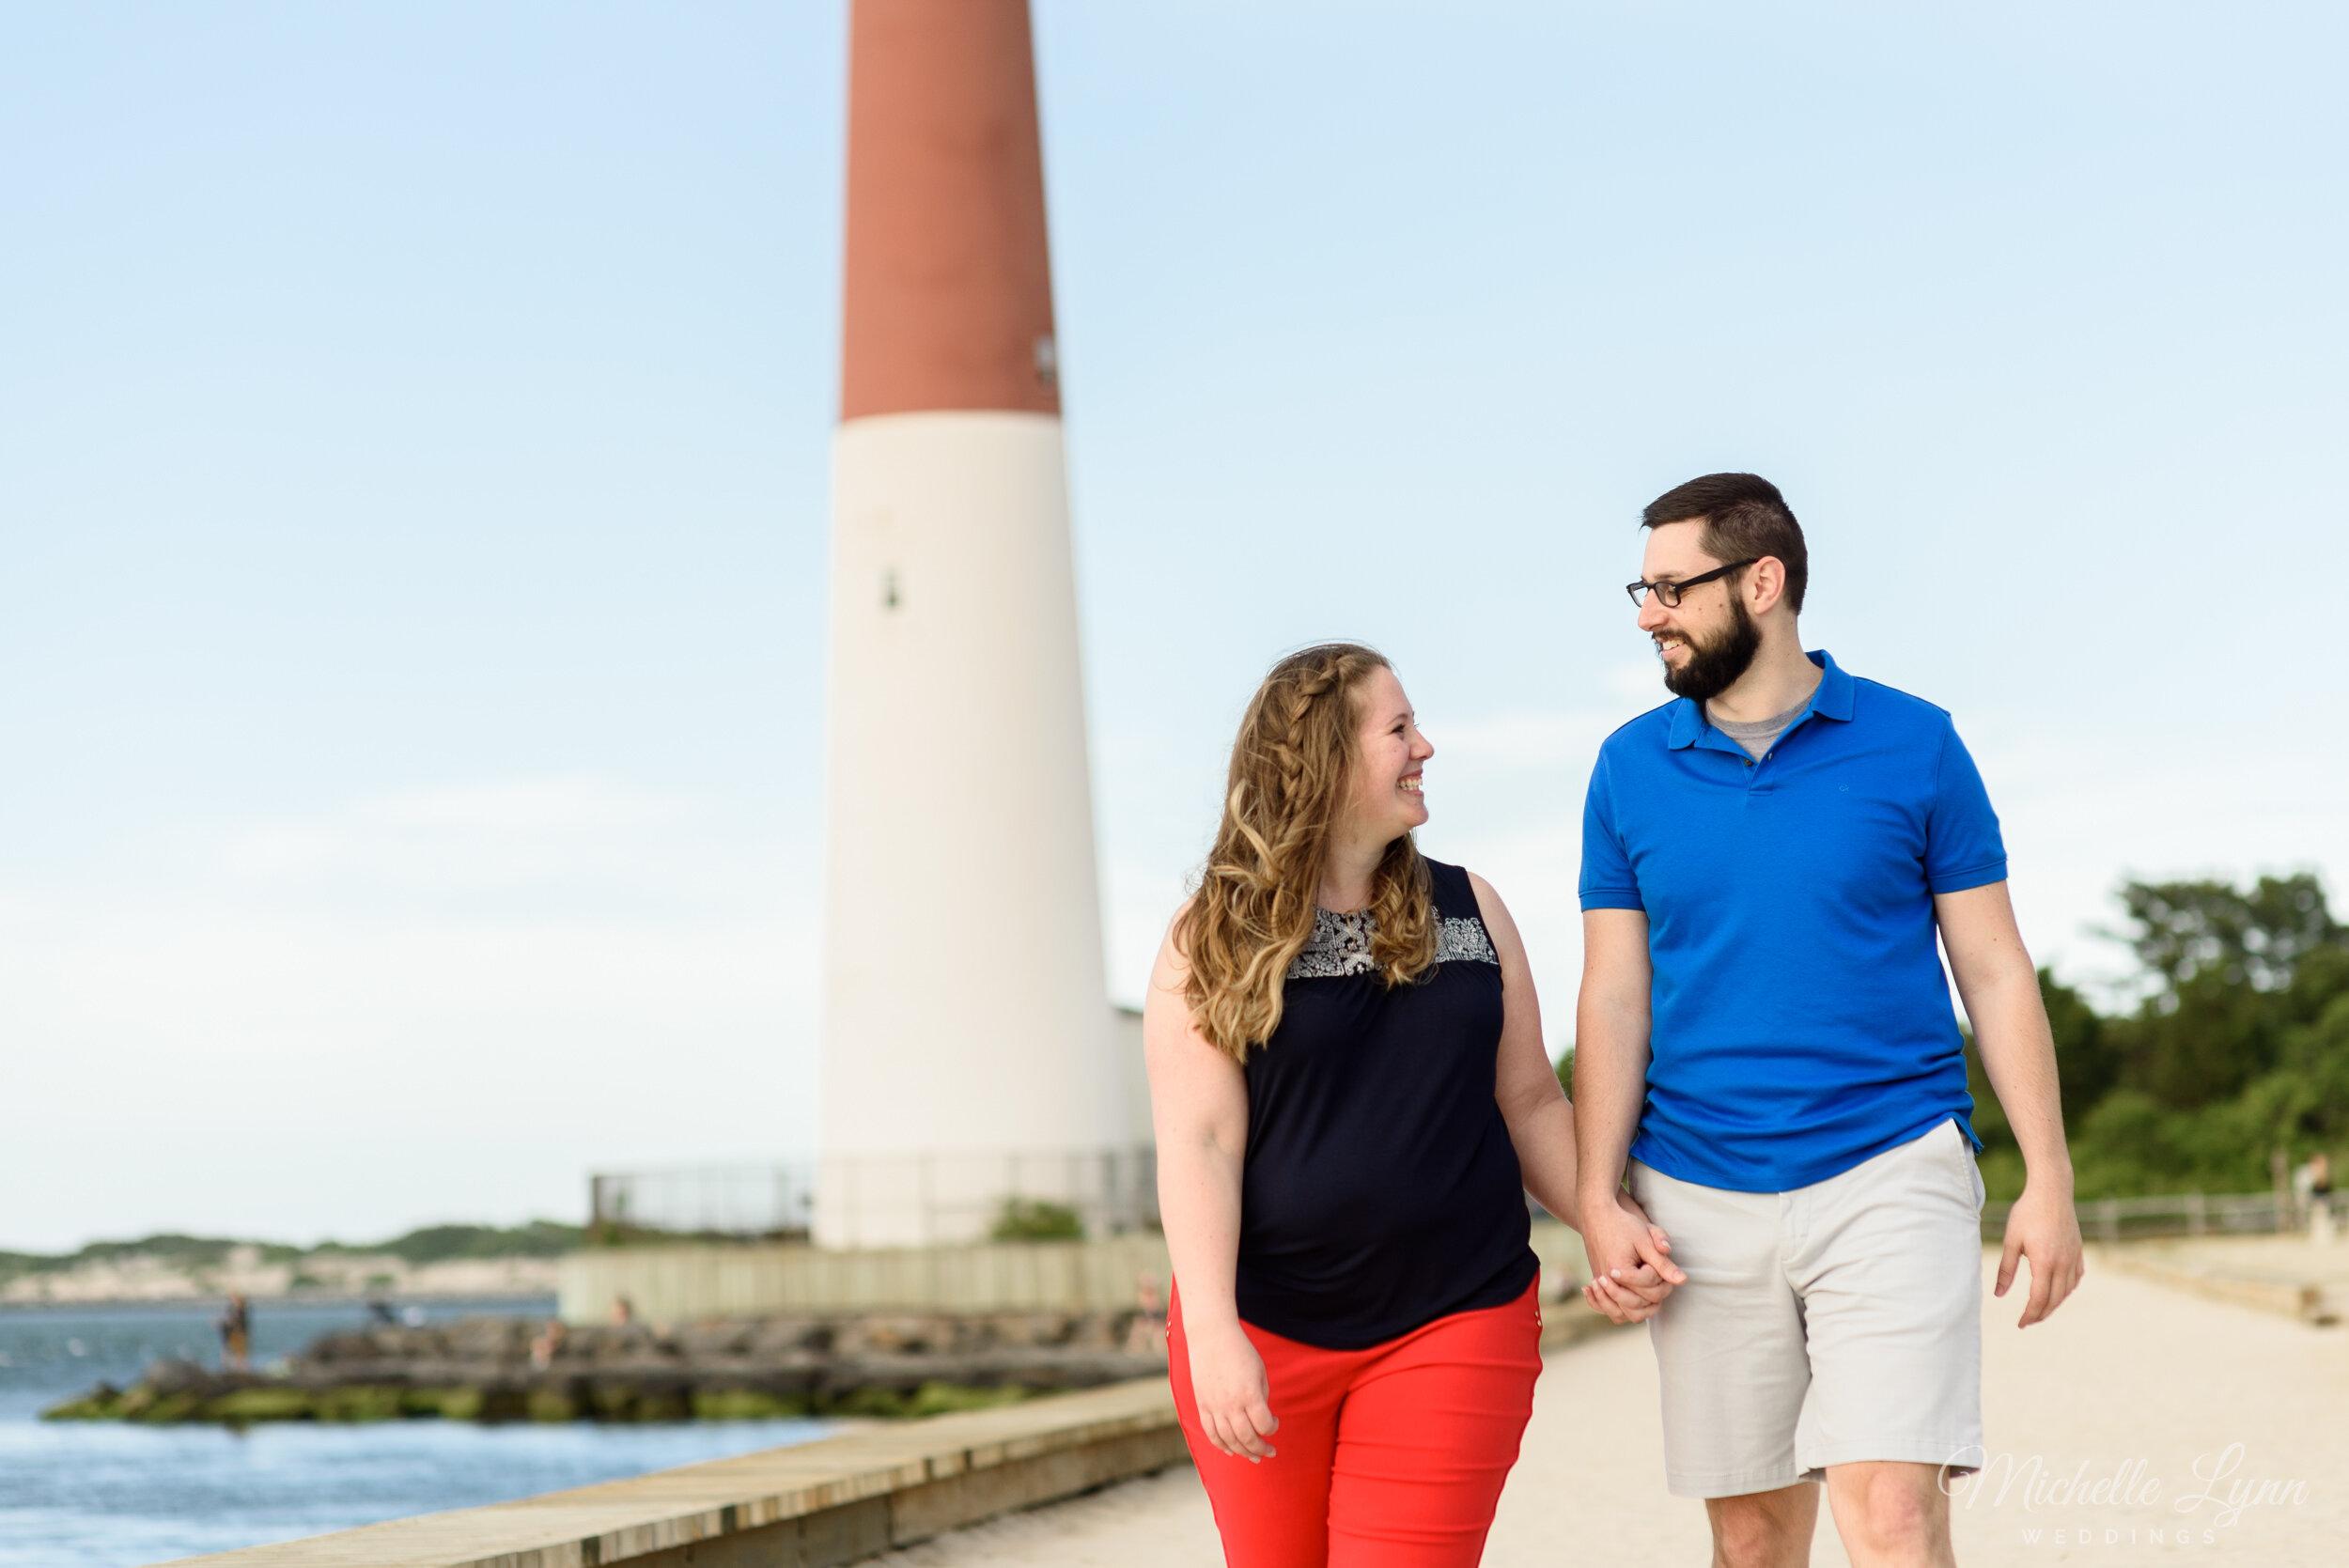 barnegat-lighthouse-engagement-photos-michelle-lynn-weddings-2.jpg